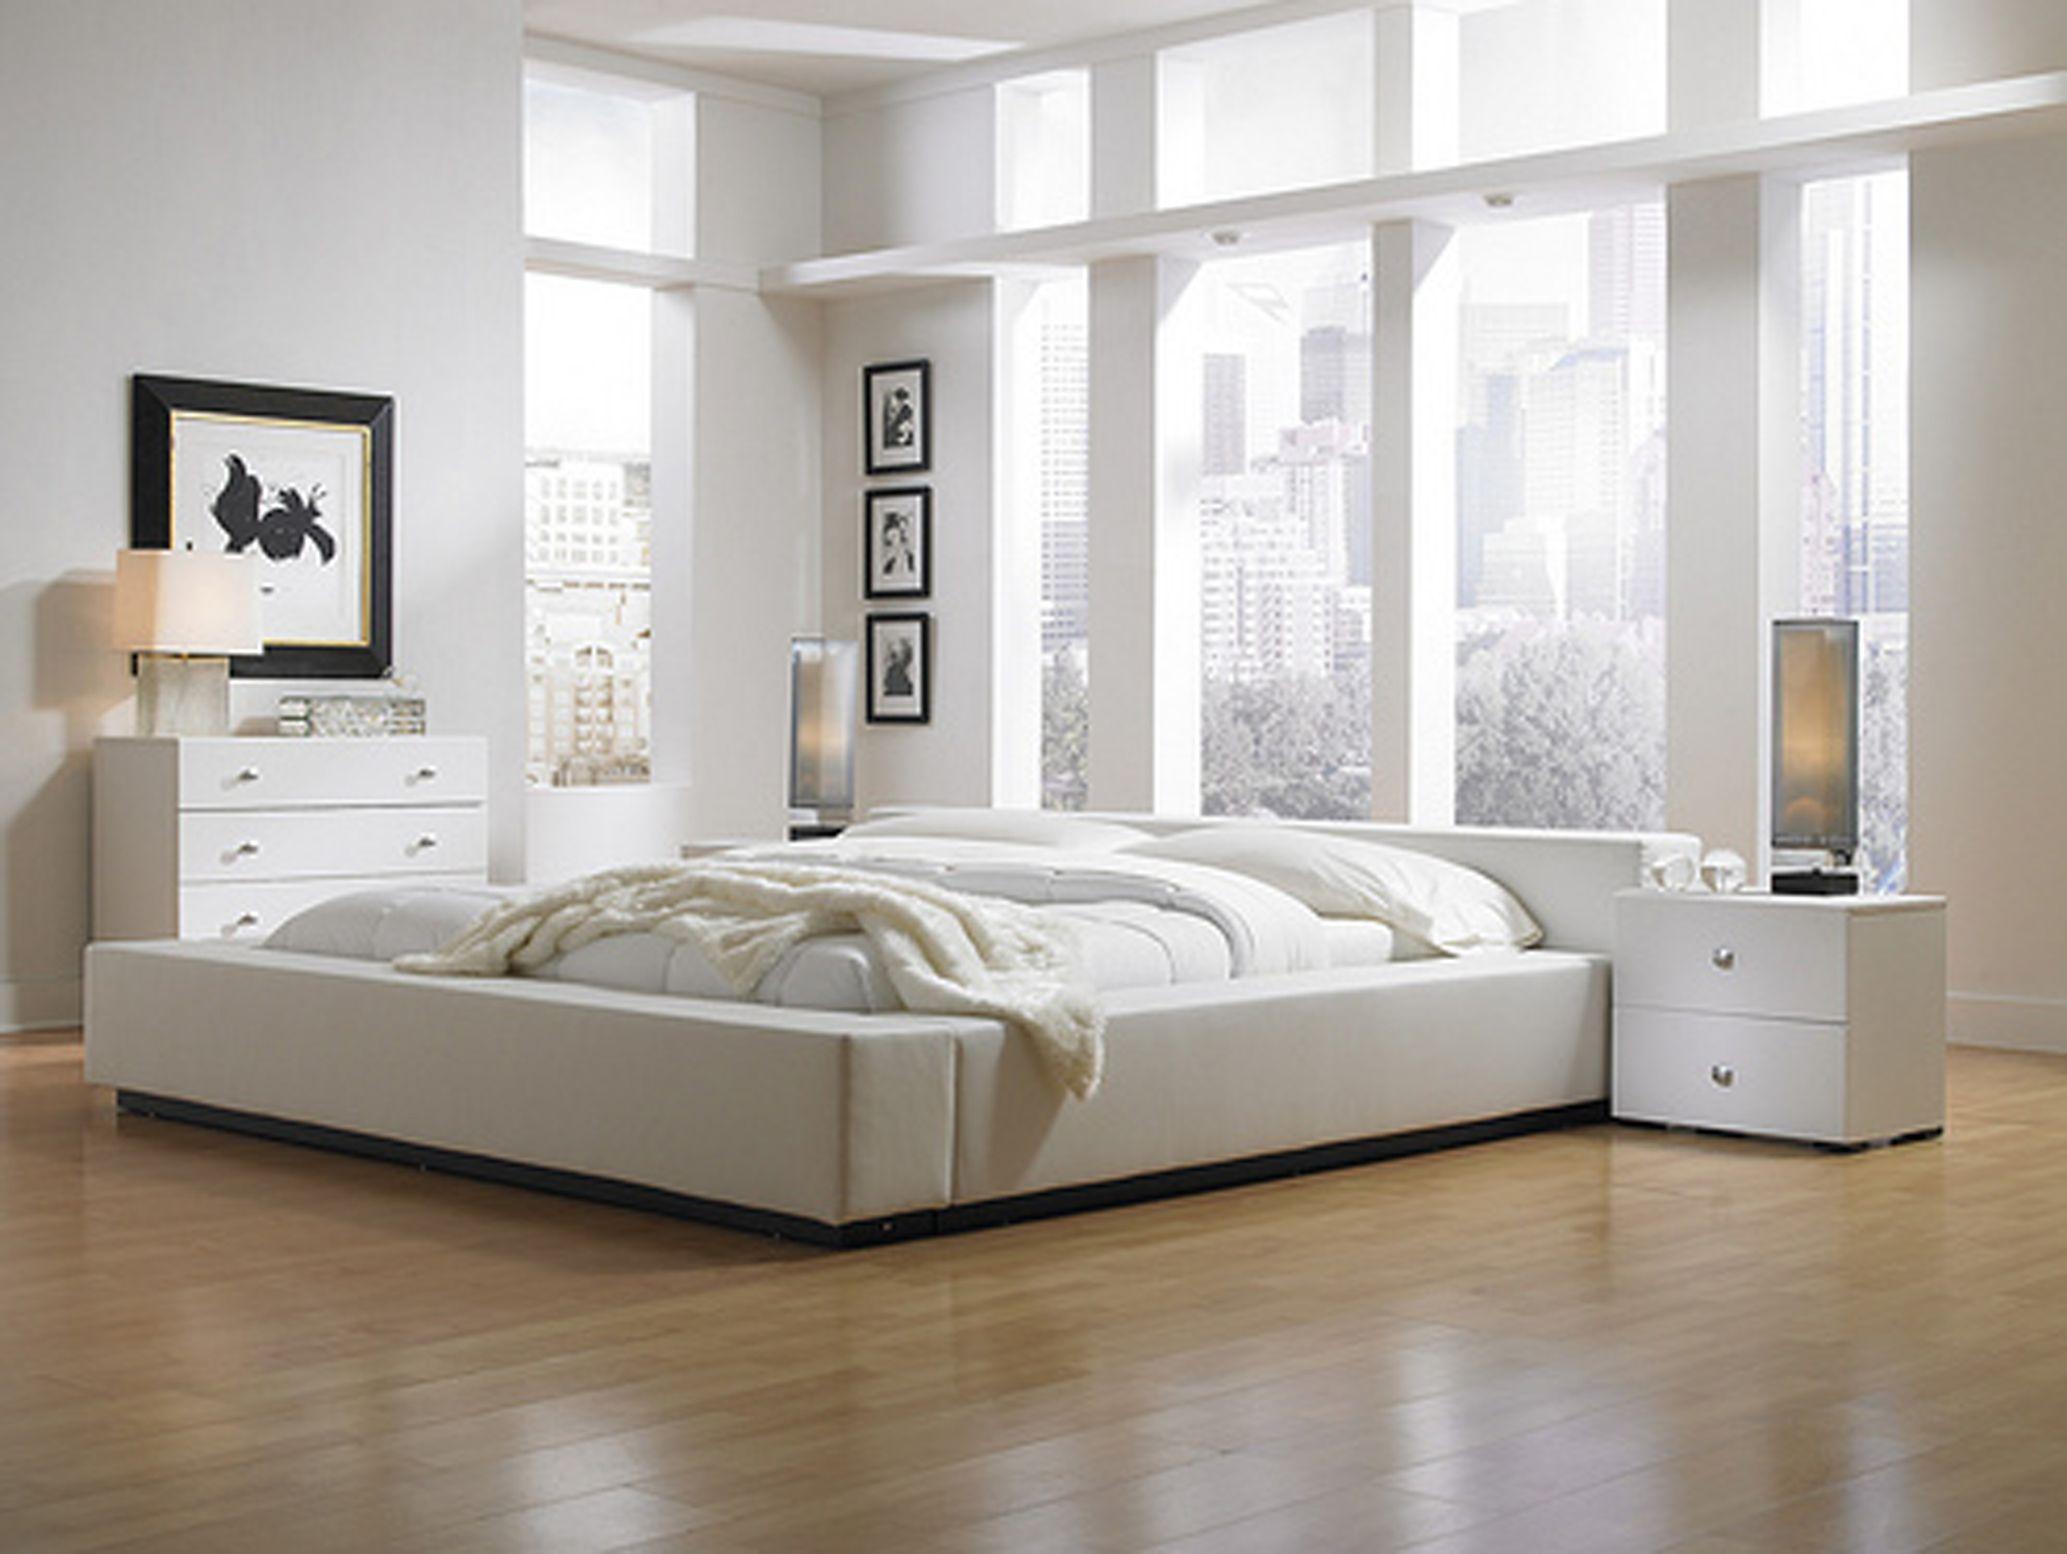 Cheap white bedroom furniture sets house pinterest minimalism